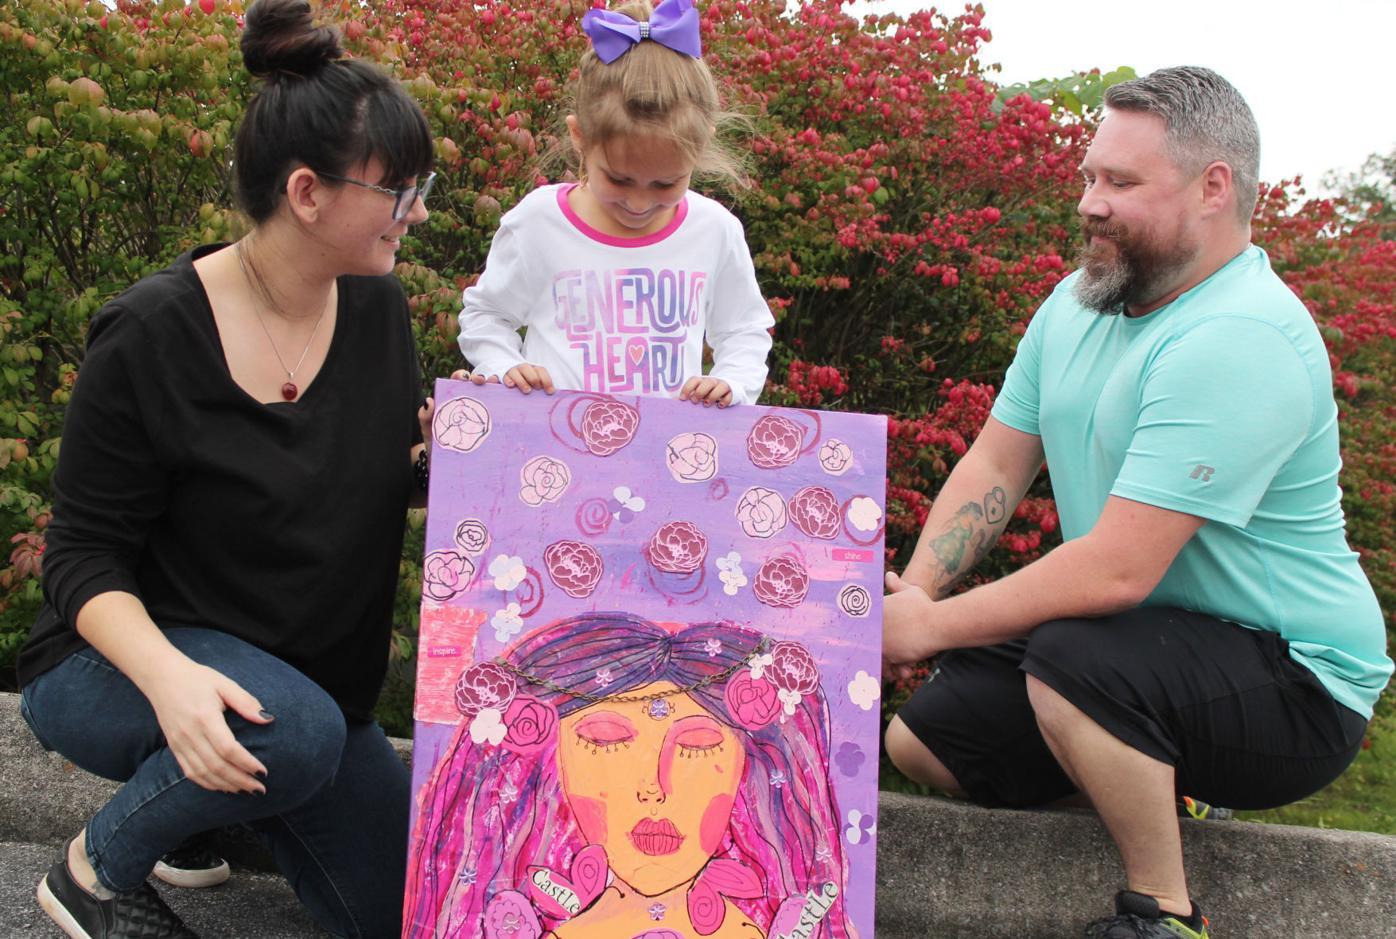 Jude Wiggins showcases artistic talent